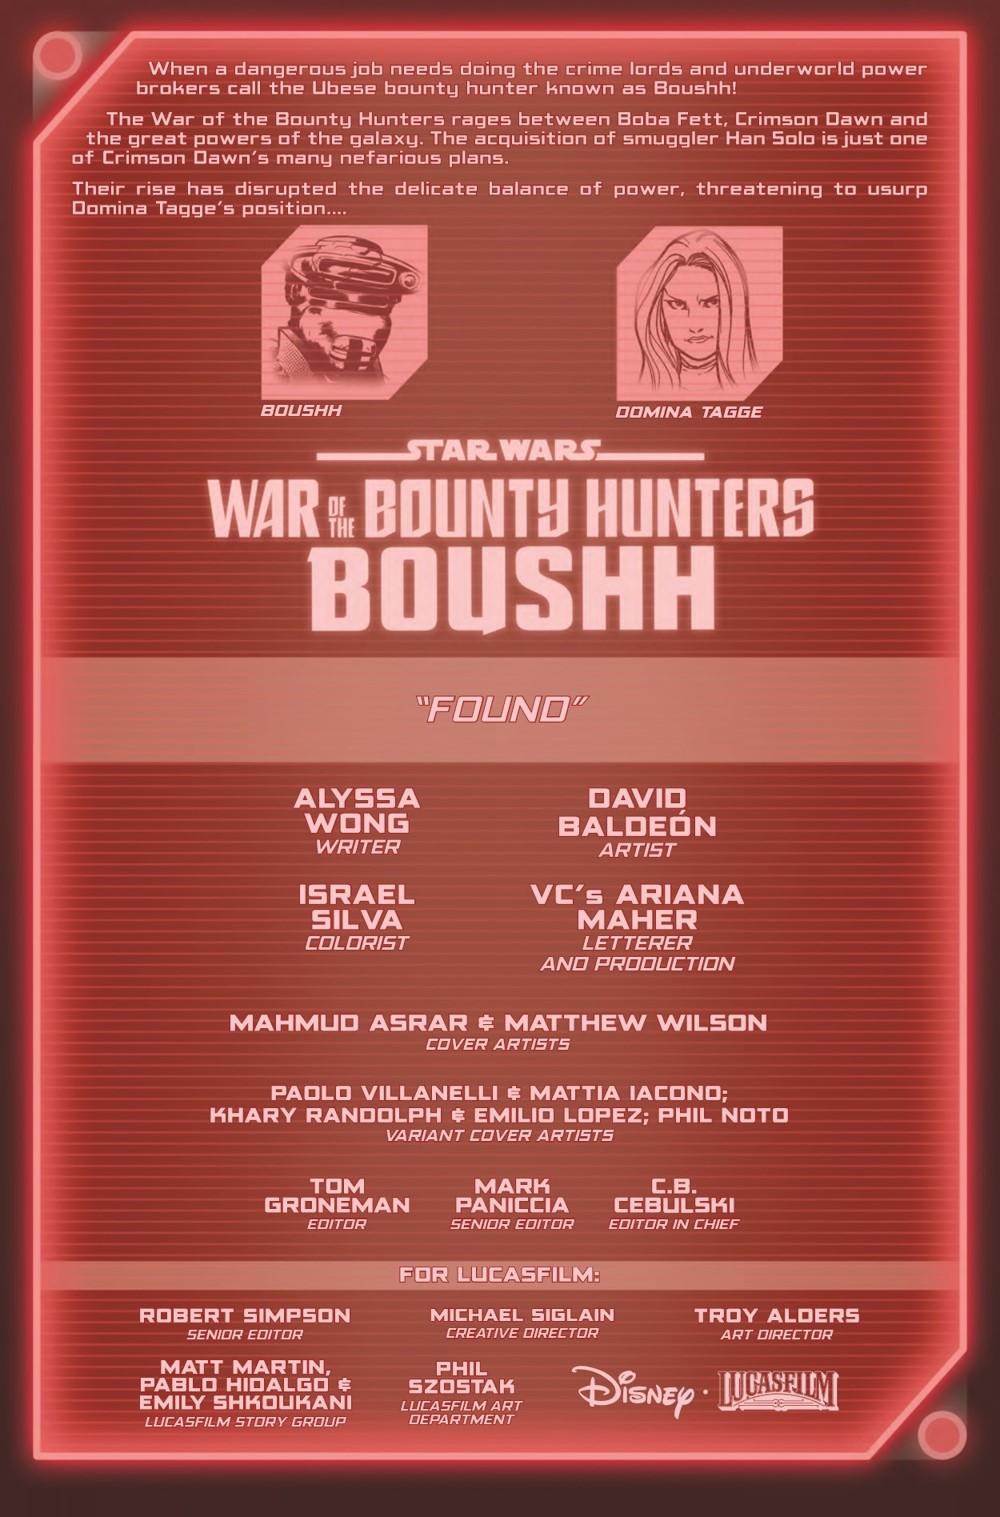 STWWAROTBHBOUSHH2021001_Preview-2 ComicList Previews: STAR WARS WAR OF THE BOUNTY HUNTERS BOUSHH #1